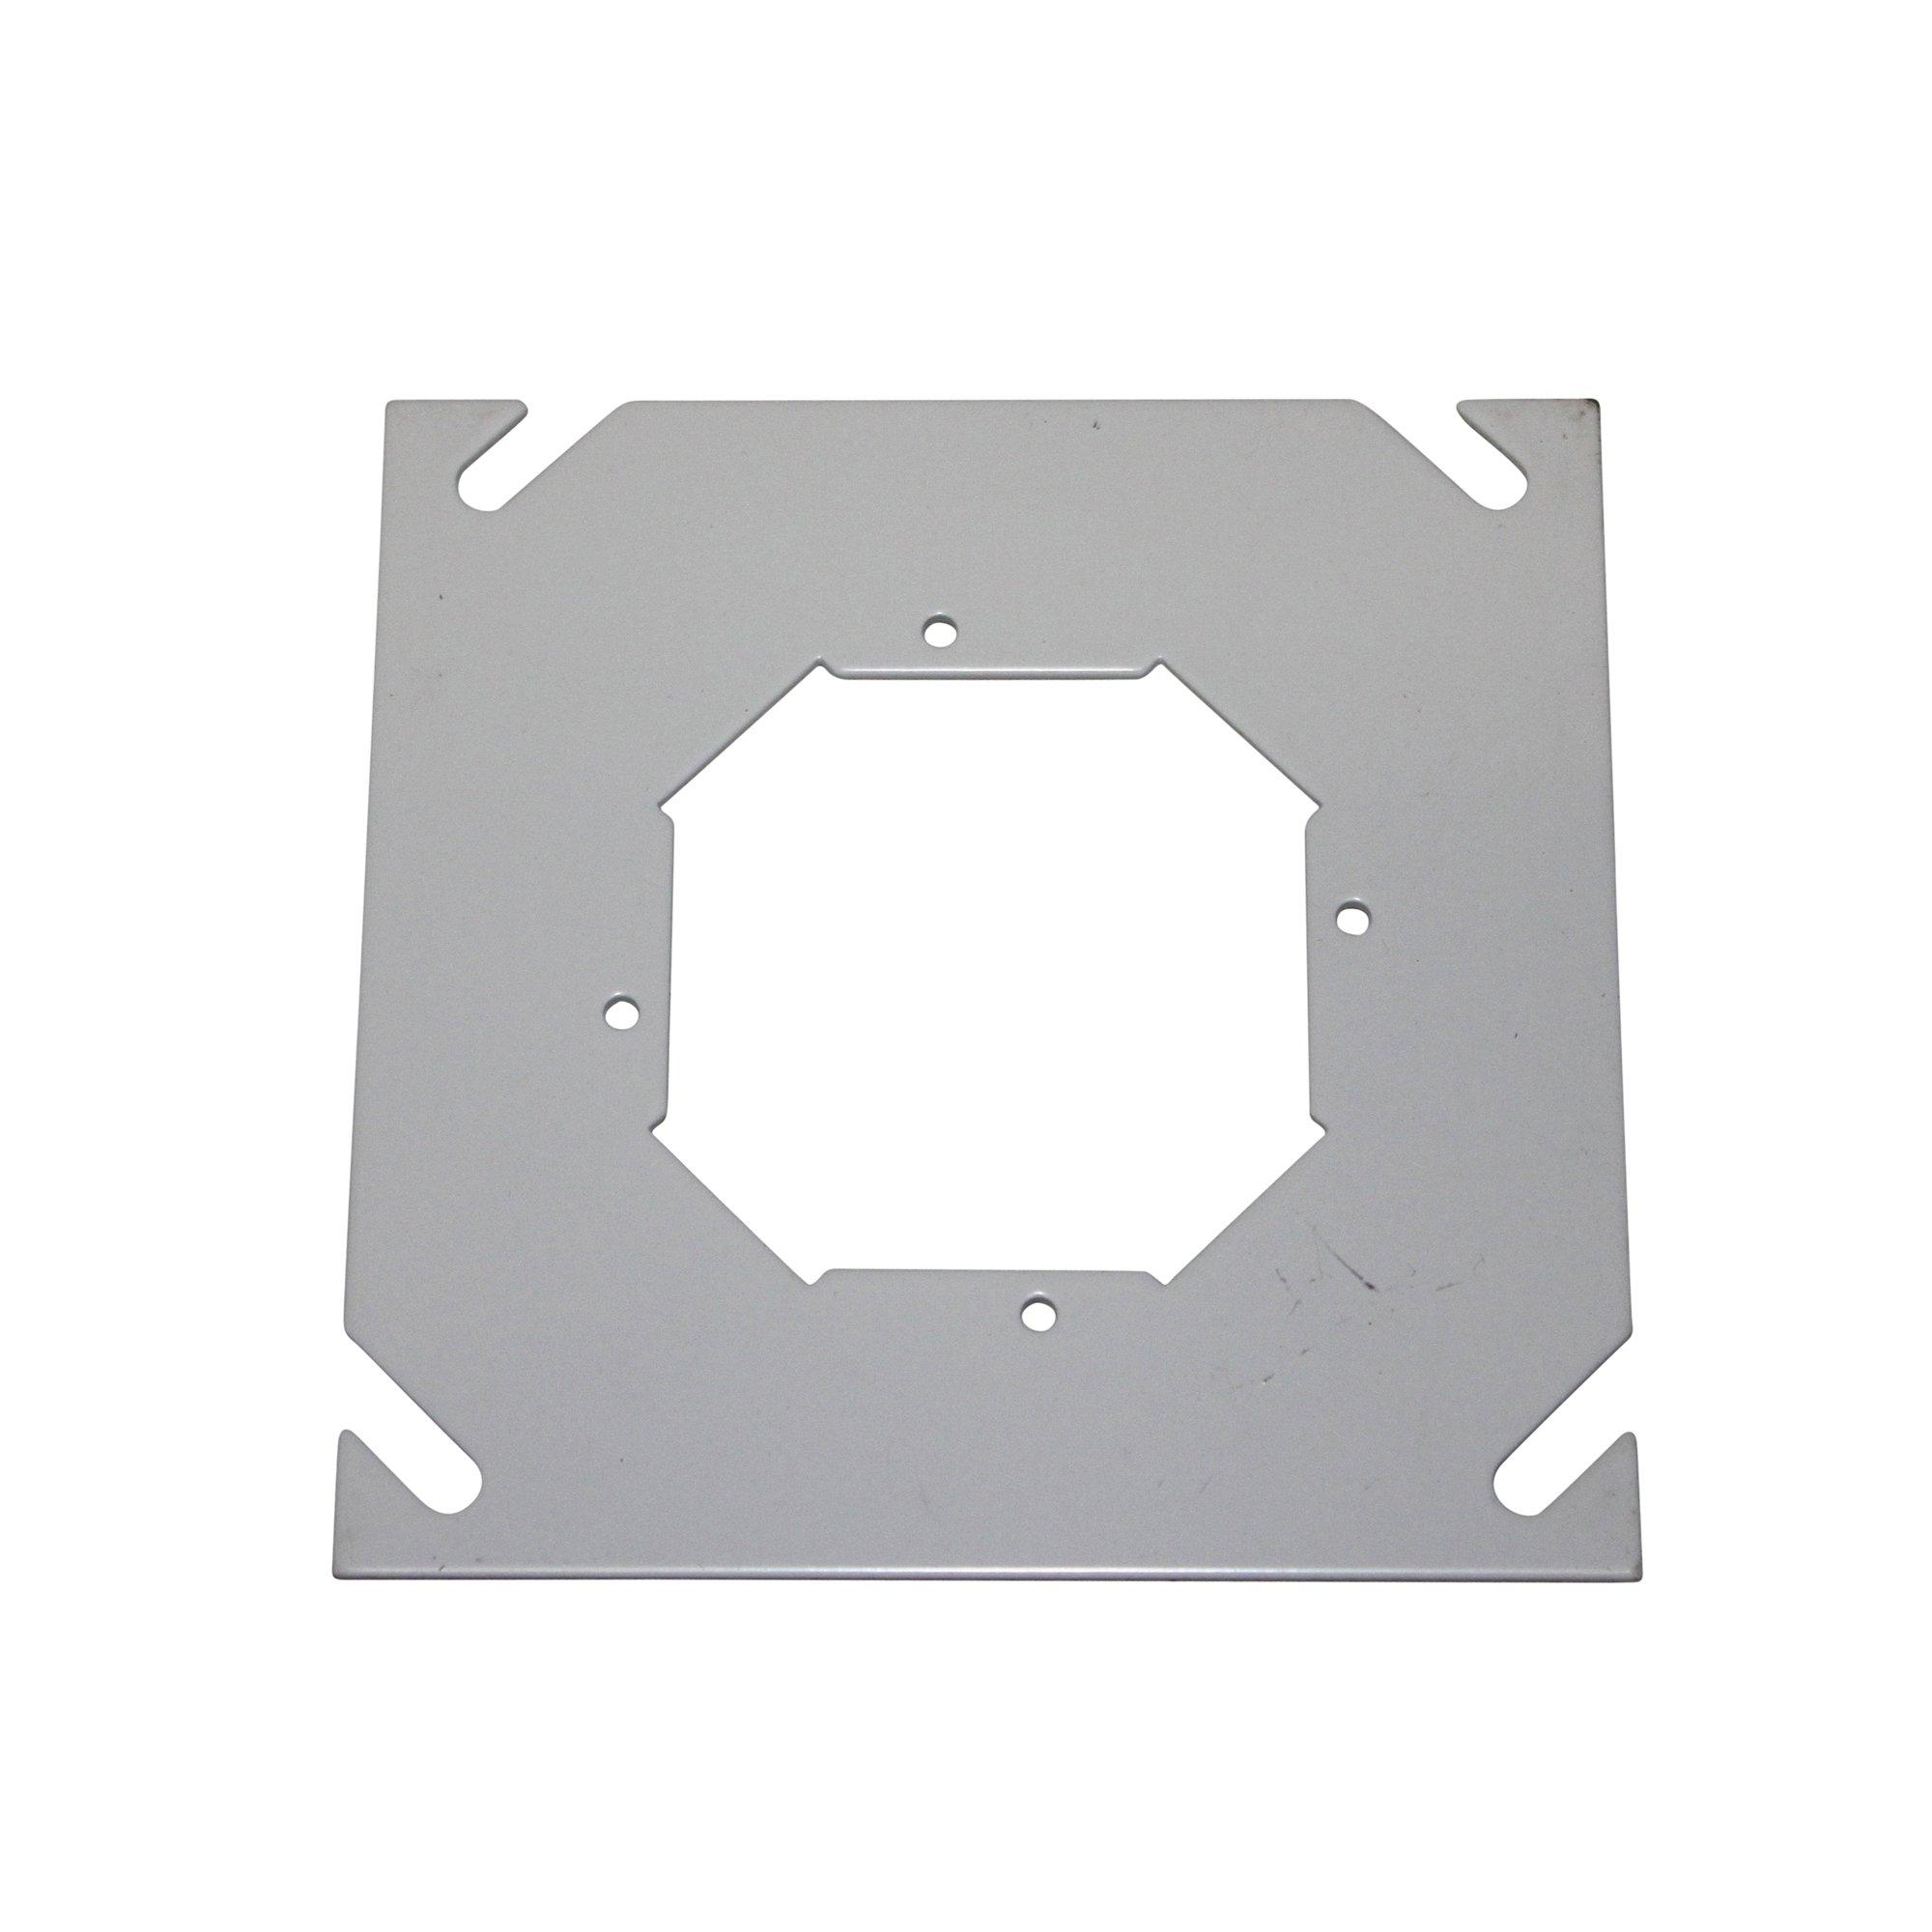 Wattstopper Ceiling Mount Motion Sensor